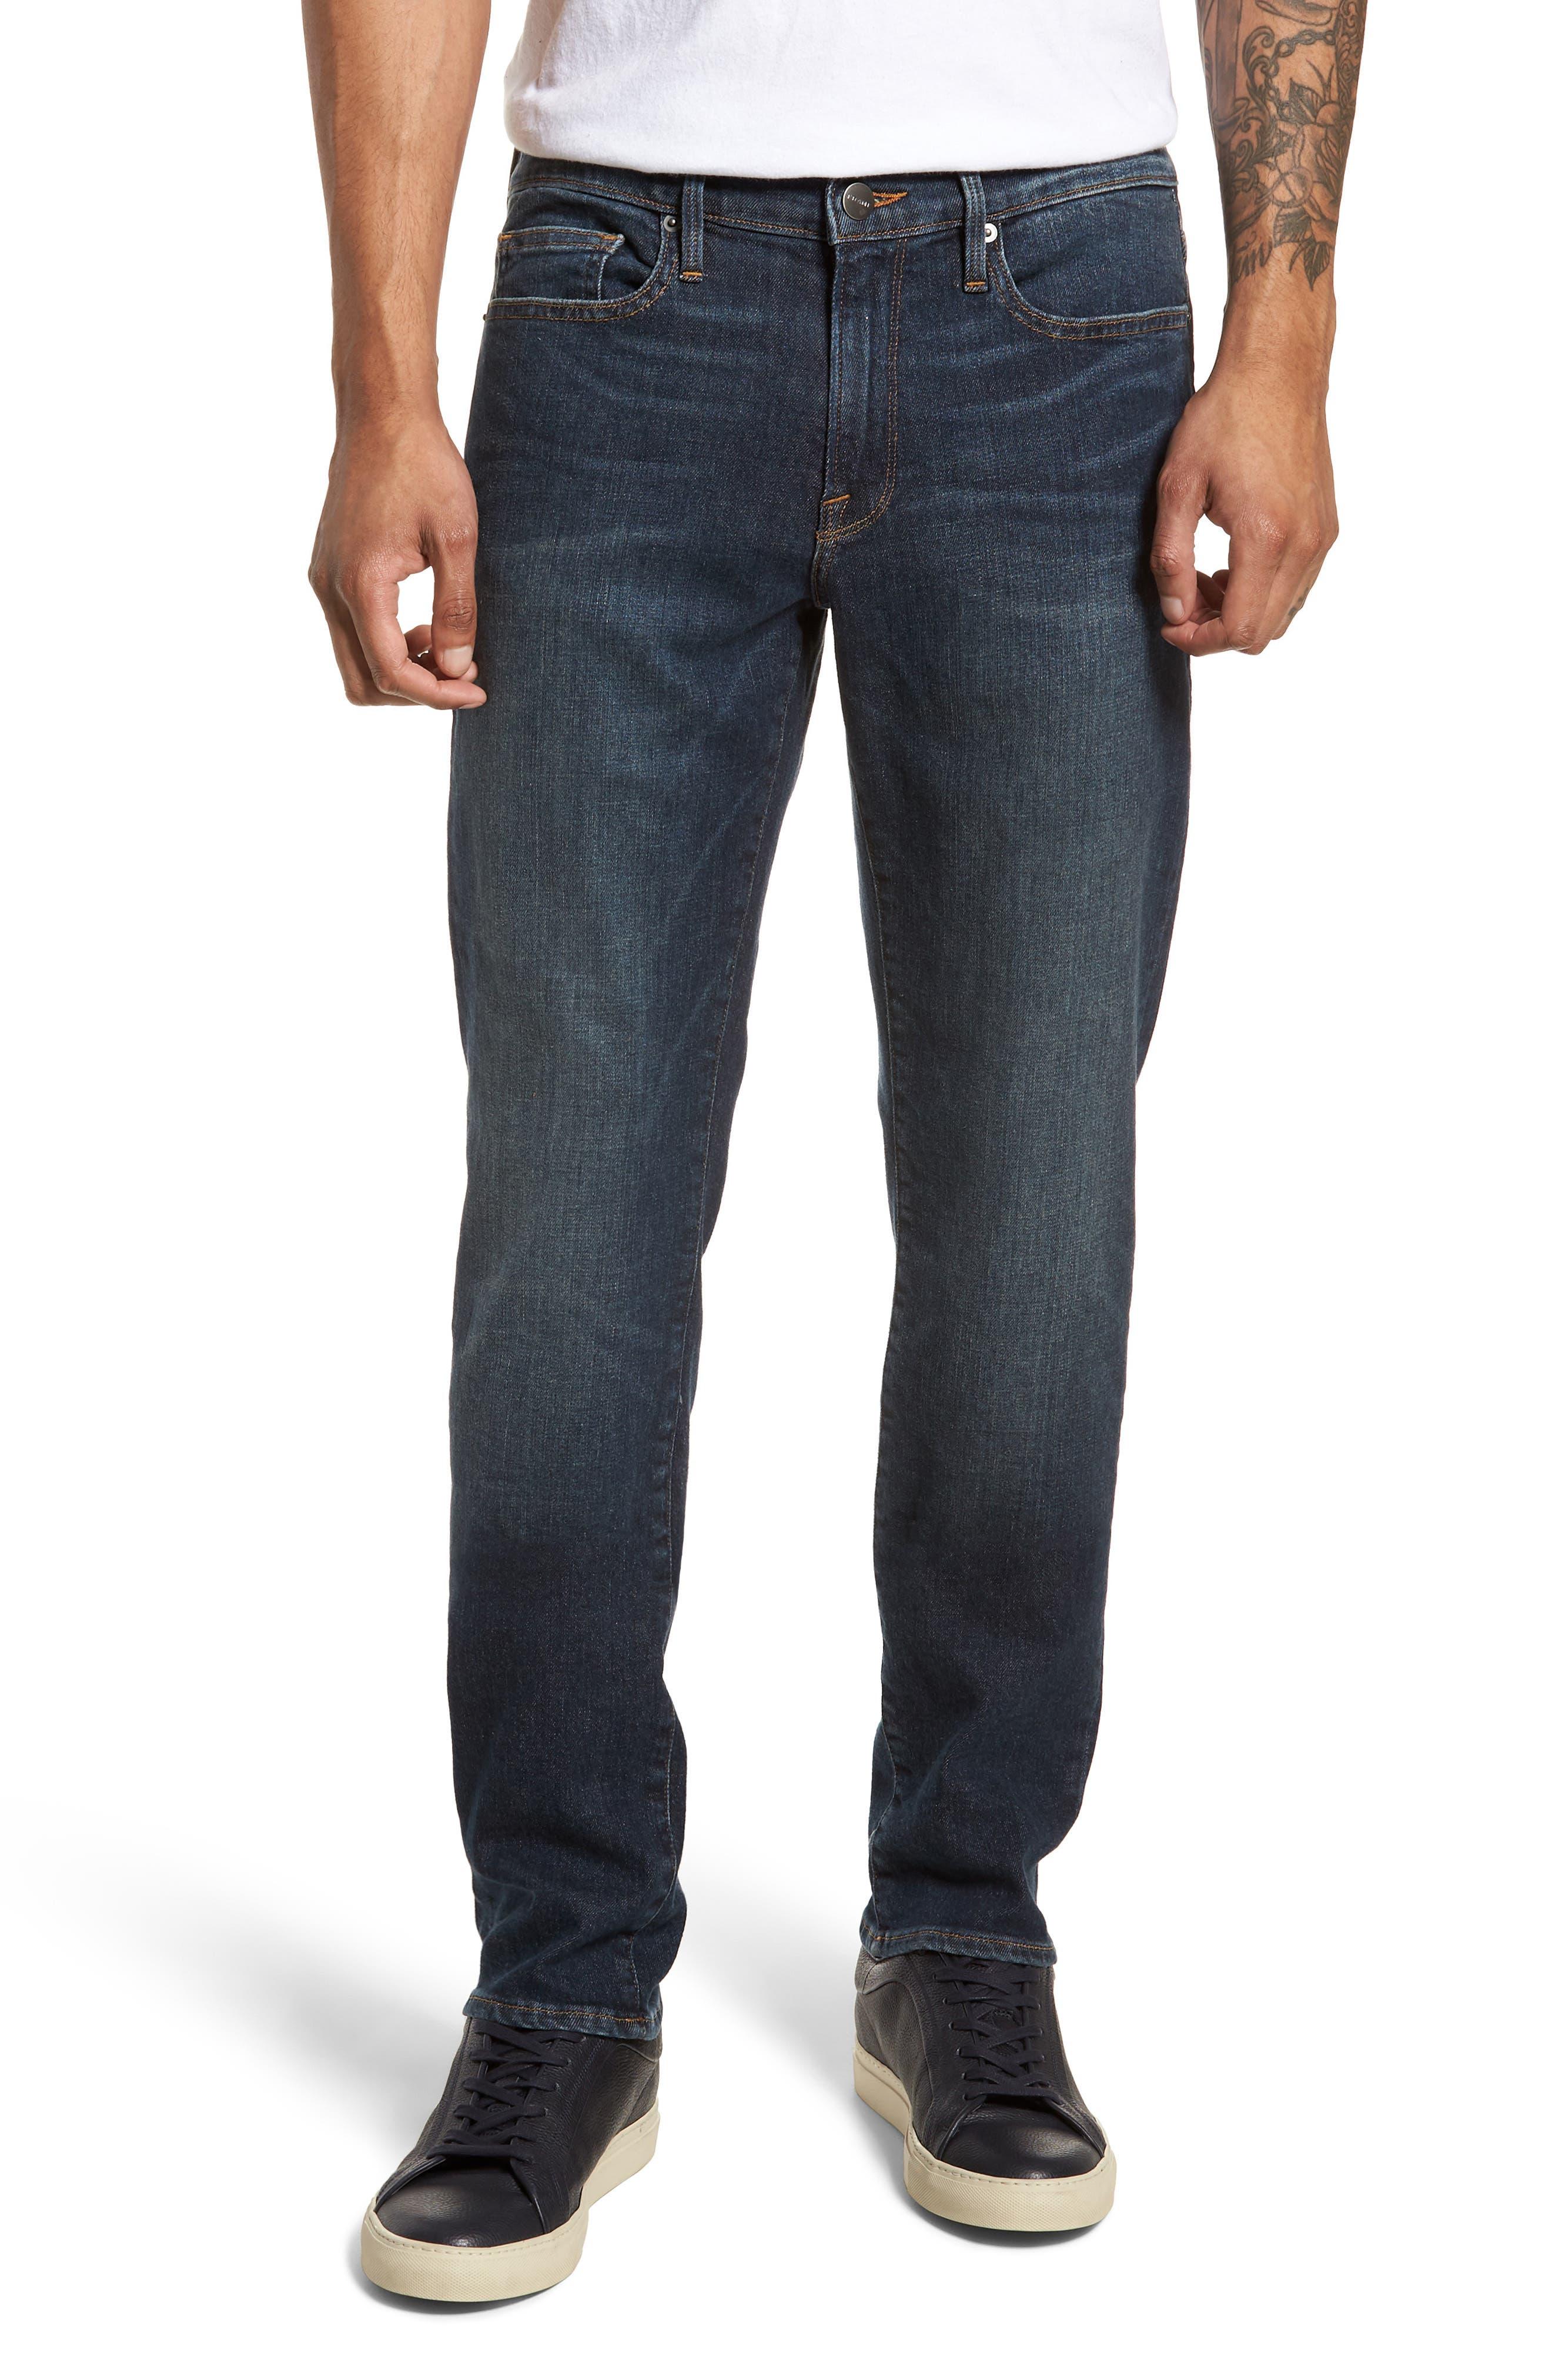 L'Homme Slim Fit Jeans,                             Main thumbnail 1, color,                             JOSHUA TREE